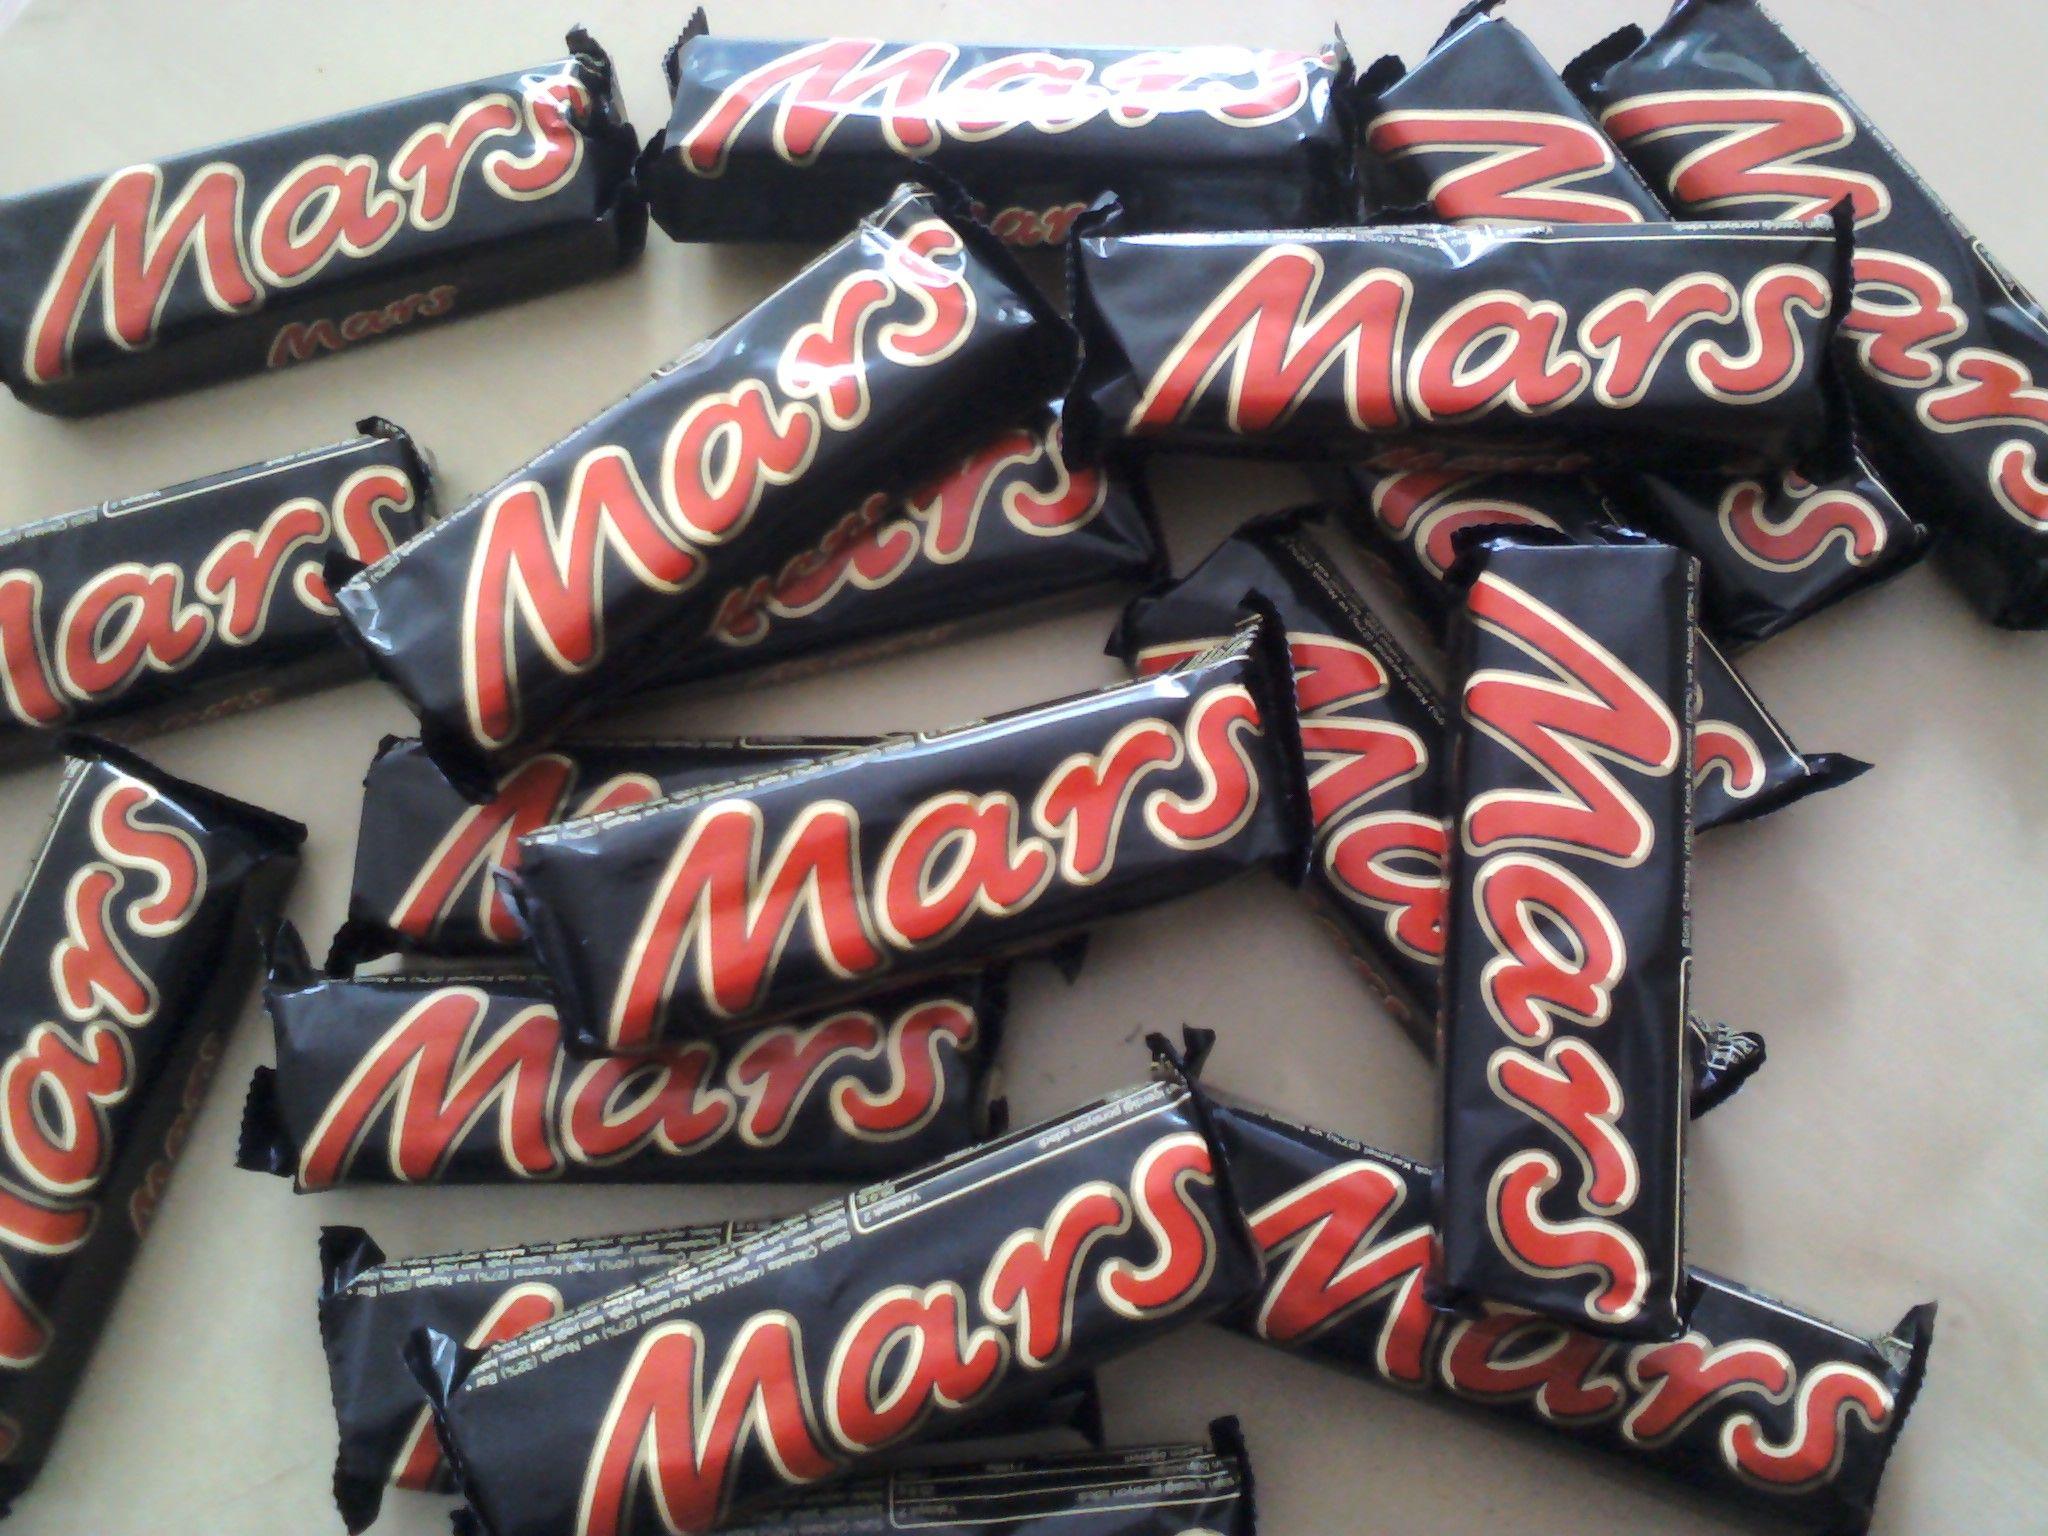 Mars - nuga ve karamel bir çubuk